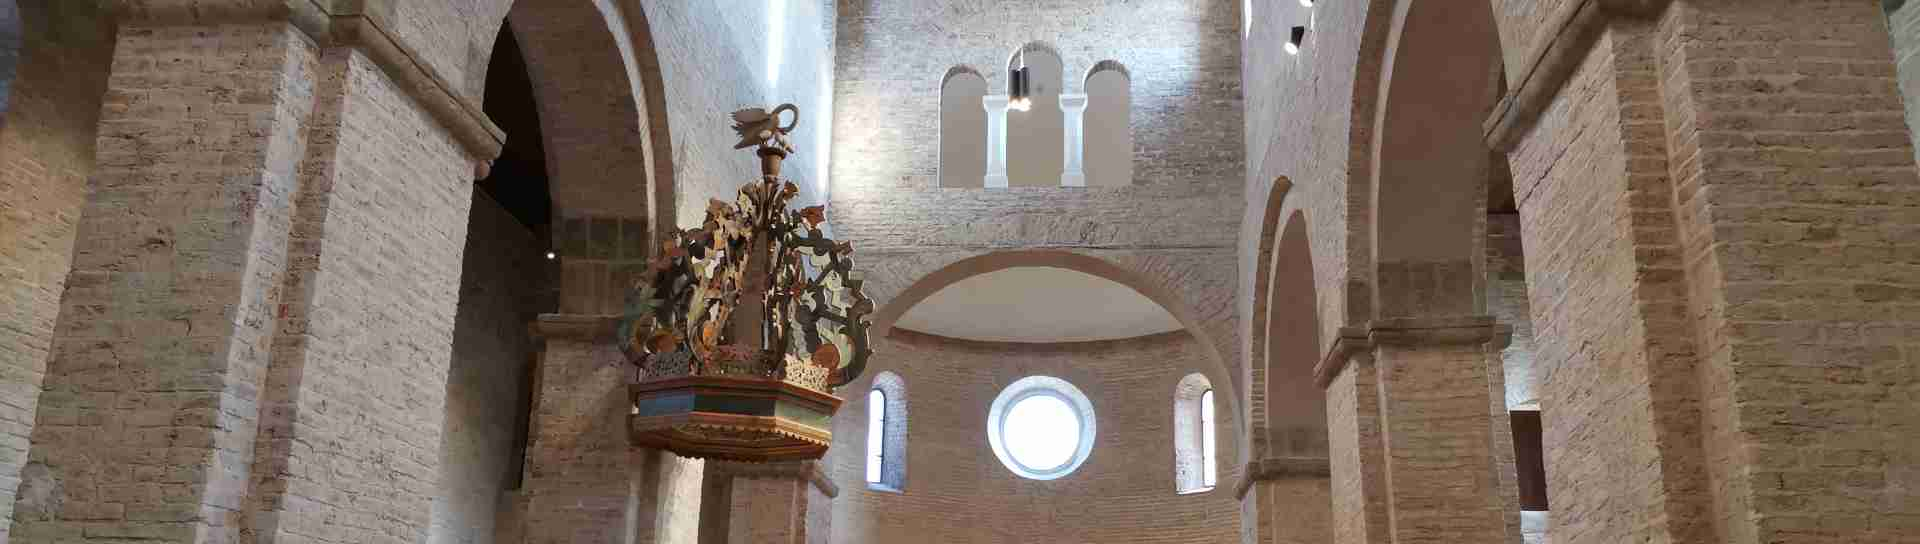 Templom belső kép